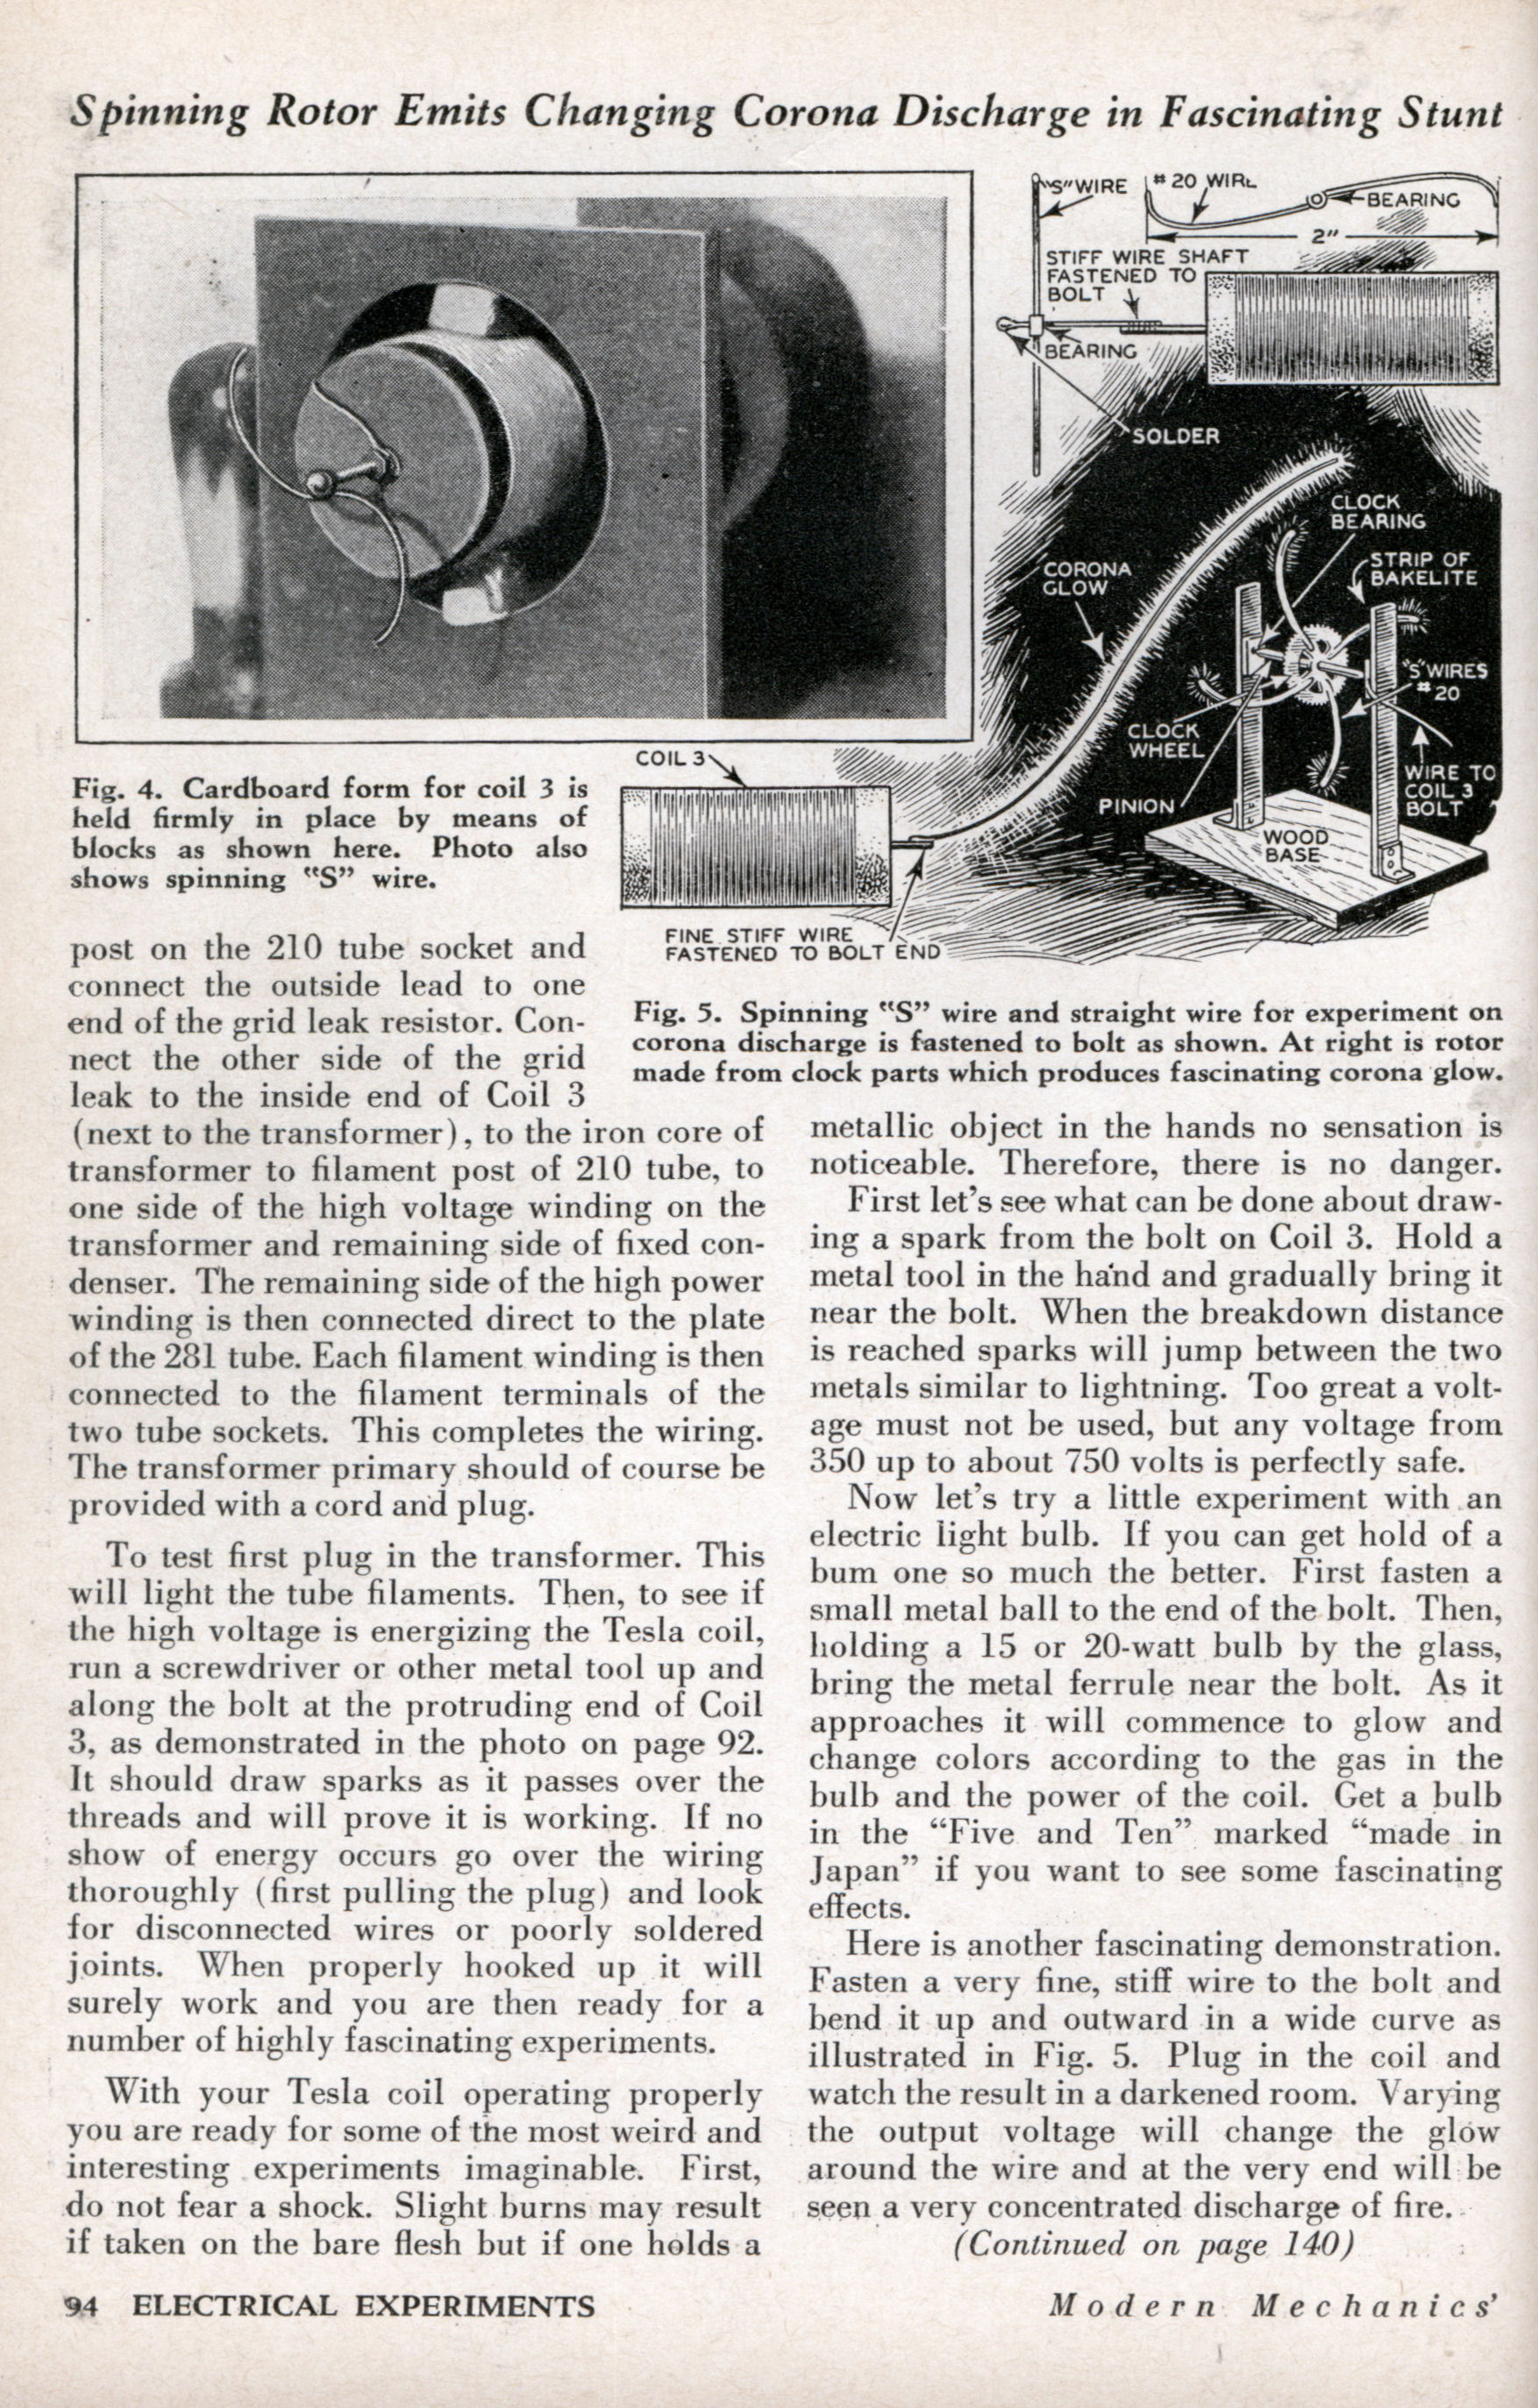 Vacuum Tube Tesla Coil Does Fascinating Stunts | Modern Mechanix ...